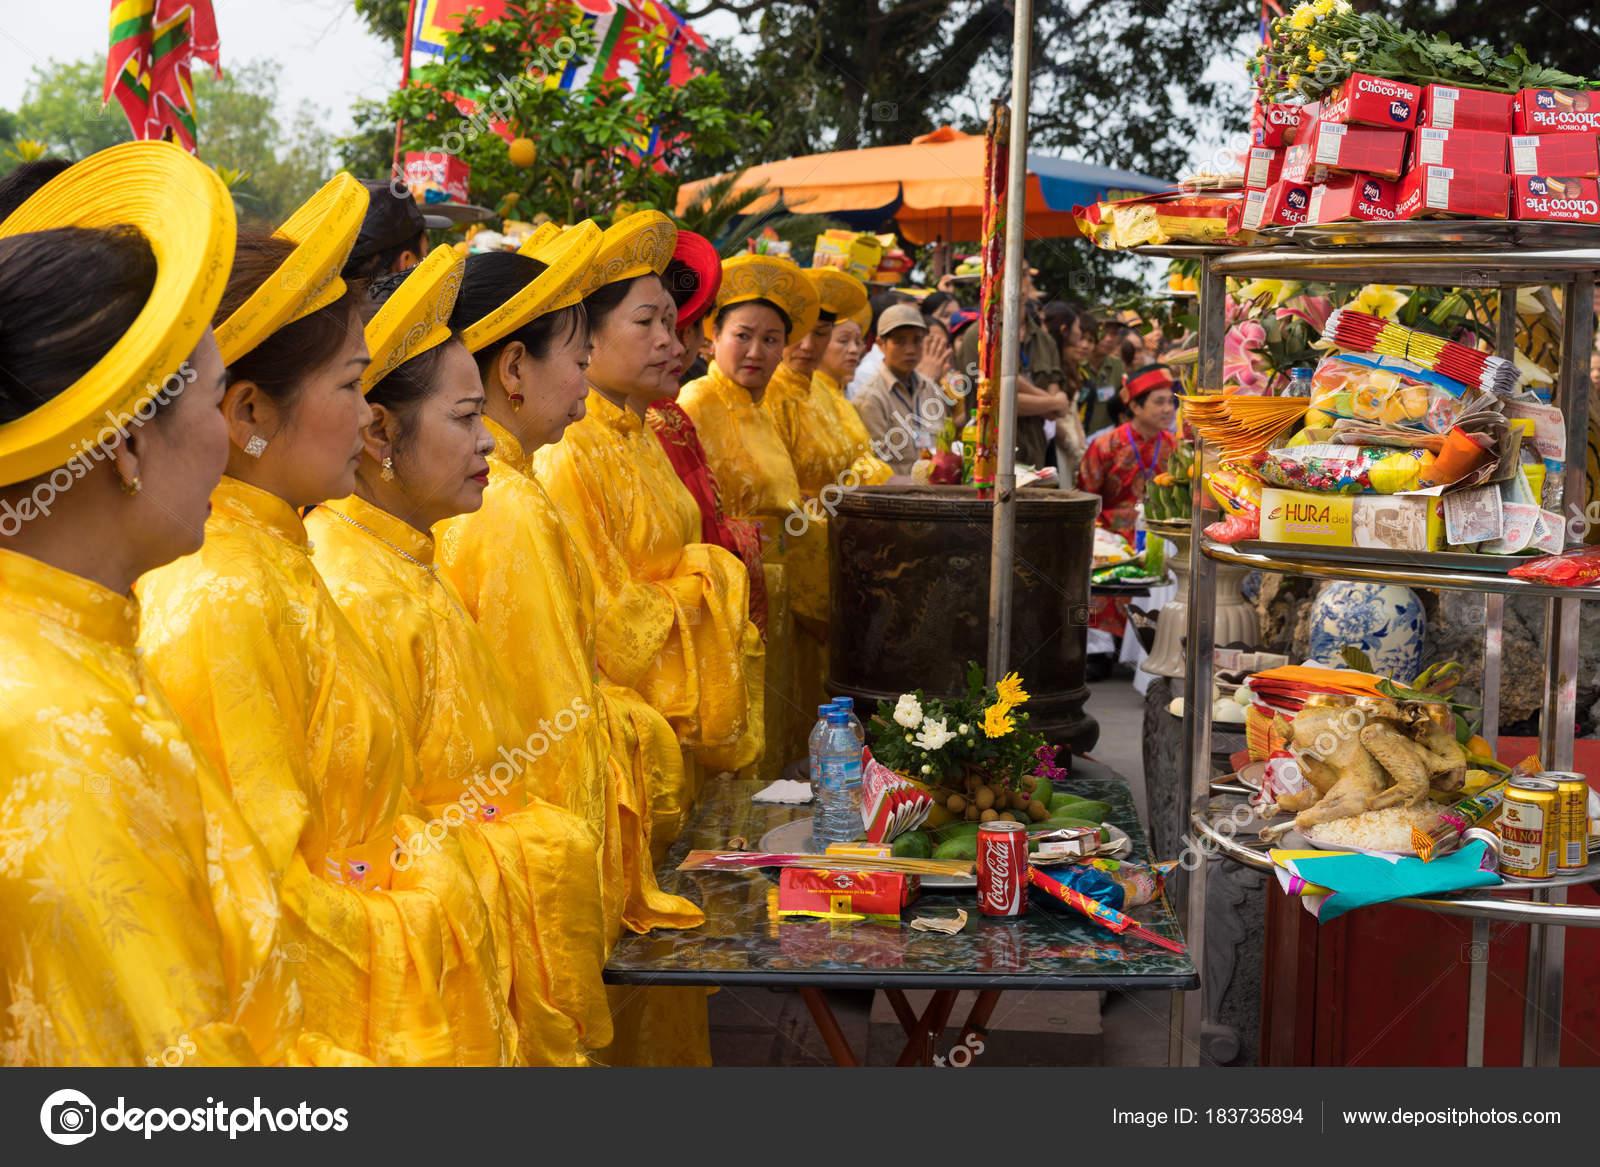 42b528e896ca Quang Νιν Βιετνάμ Mar 2015 Παλιά Γυναίκες Στο Παραδοσιακό Φόρεμα– Εκδοτικές  Φωτογραφίες Αρχείου